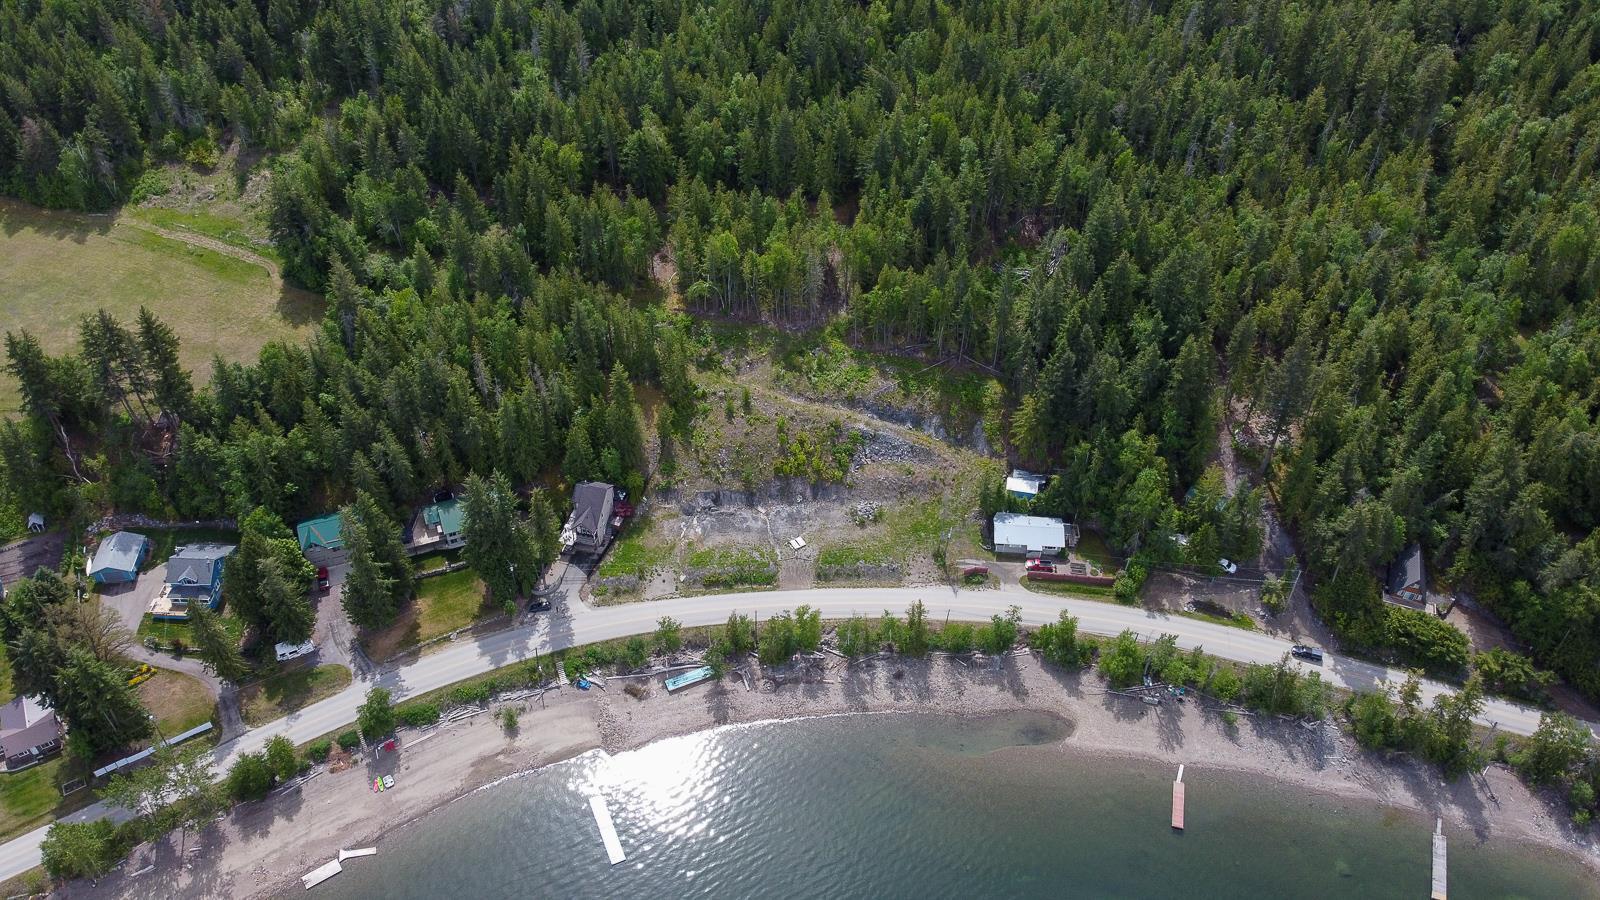 Lot 1-5 Blind Bay Road,, Blind Bay, British Columbia  V0E 1H0 - Photo 4 - 10232466